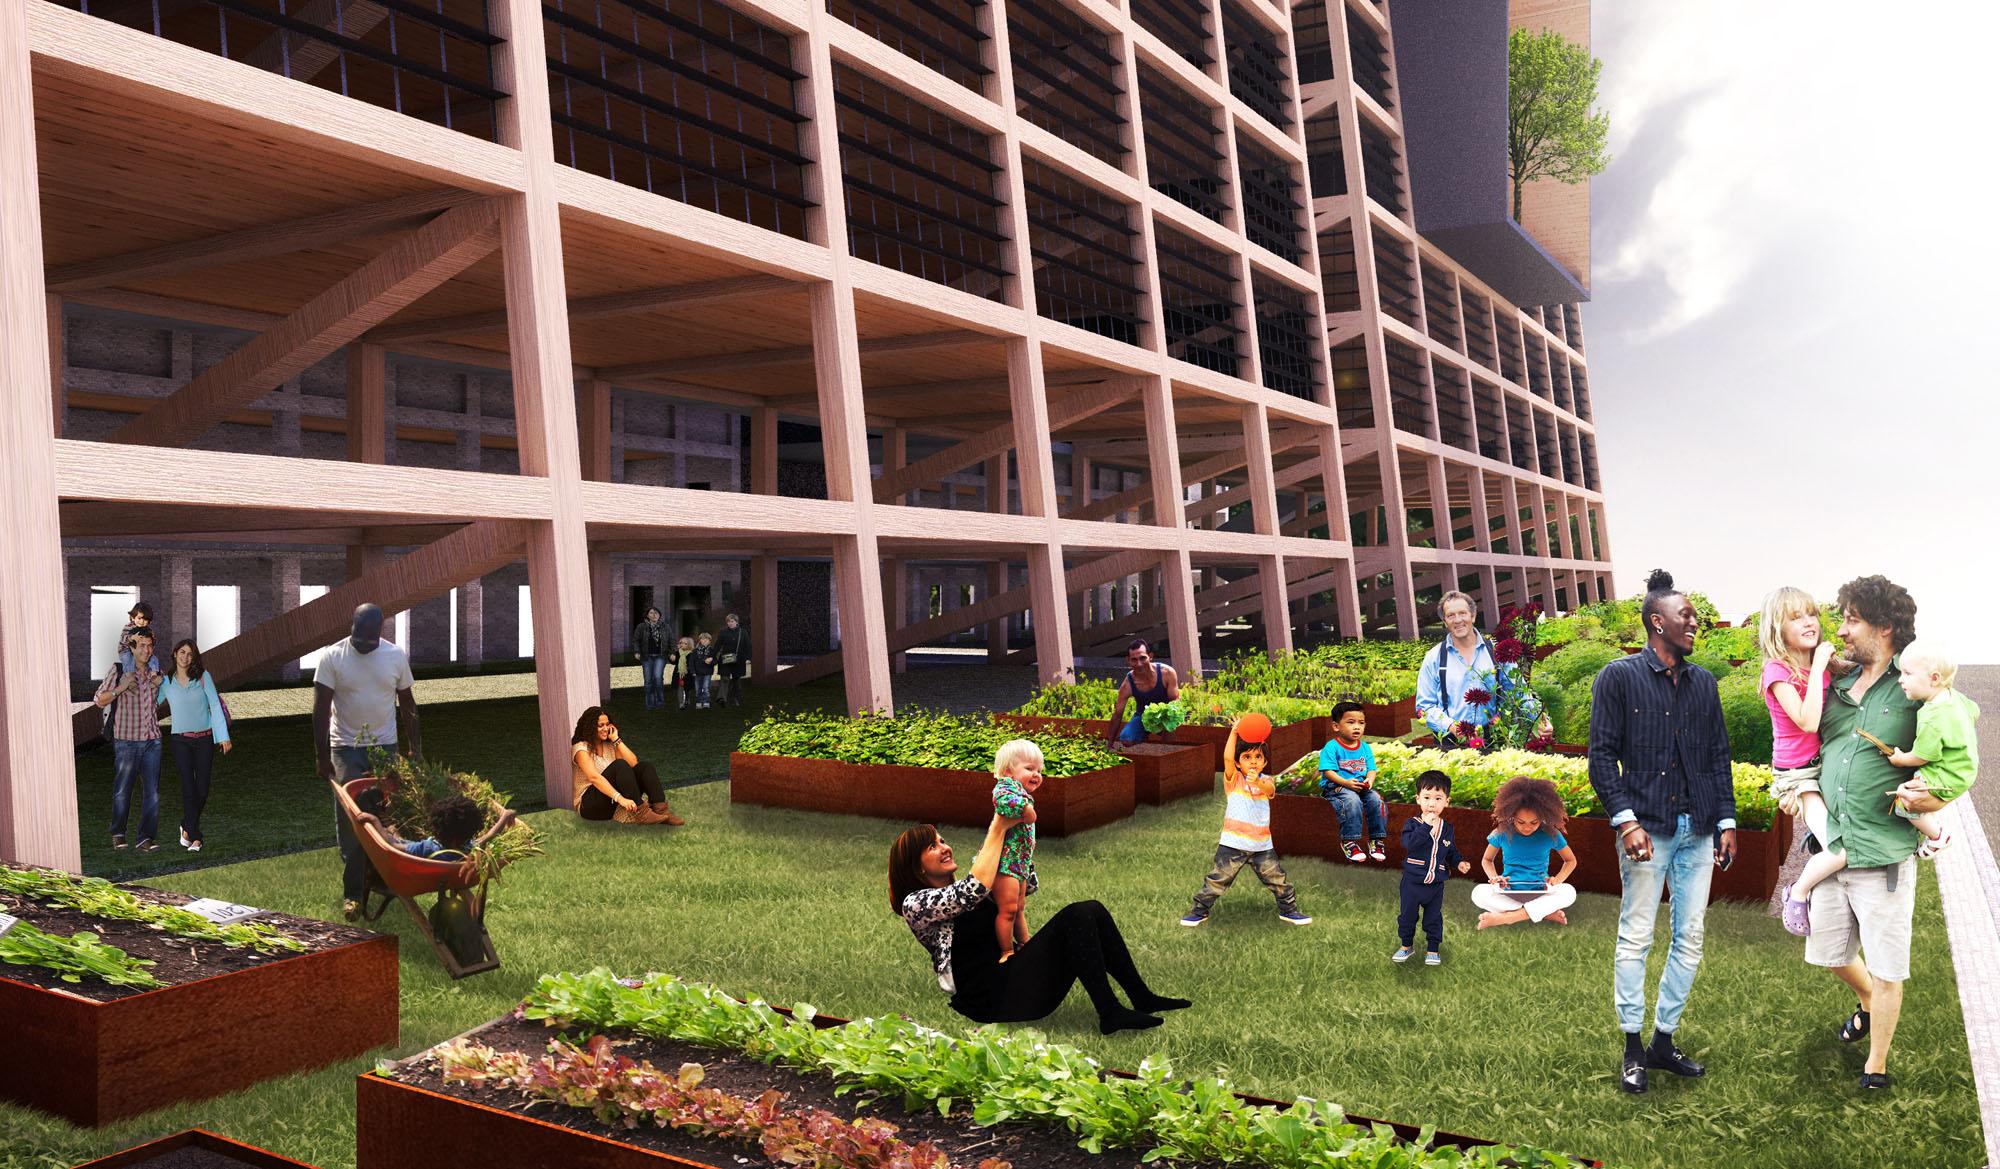 Aequitas urban farm view